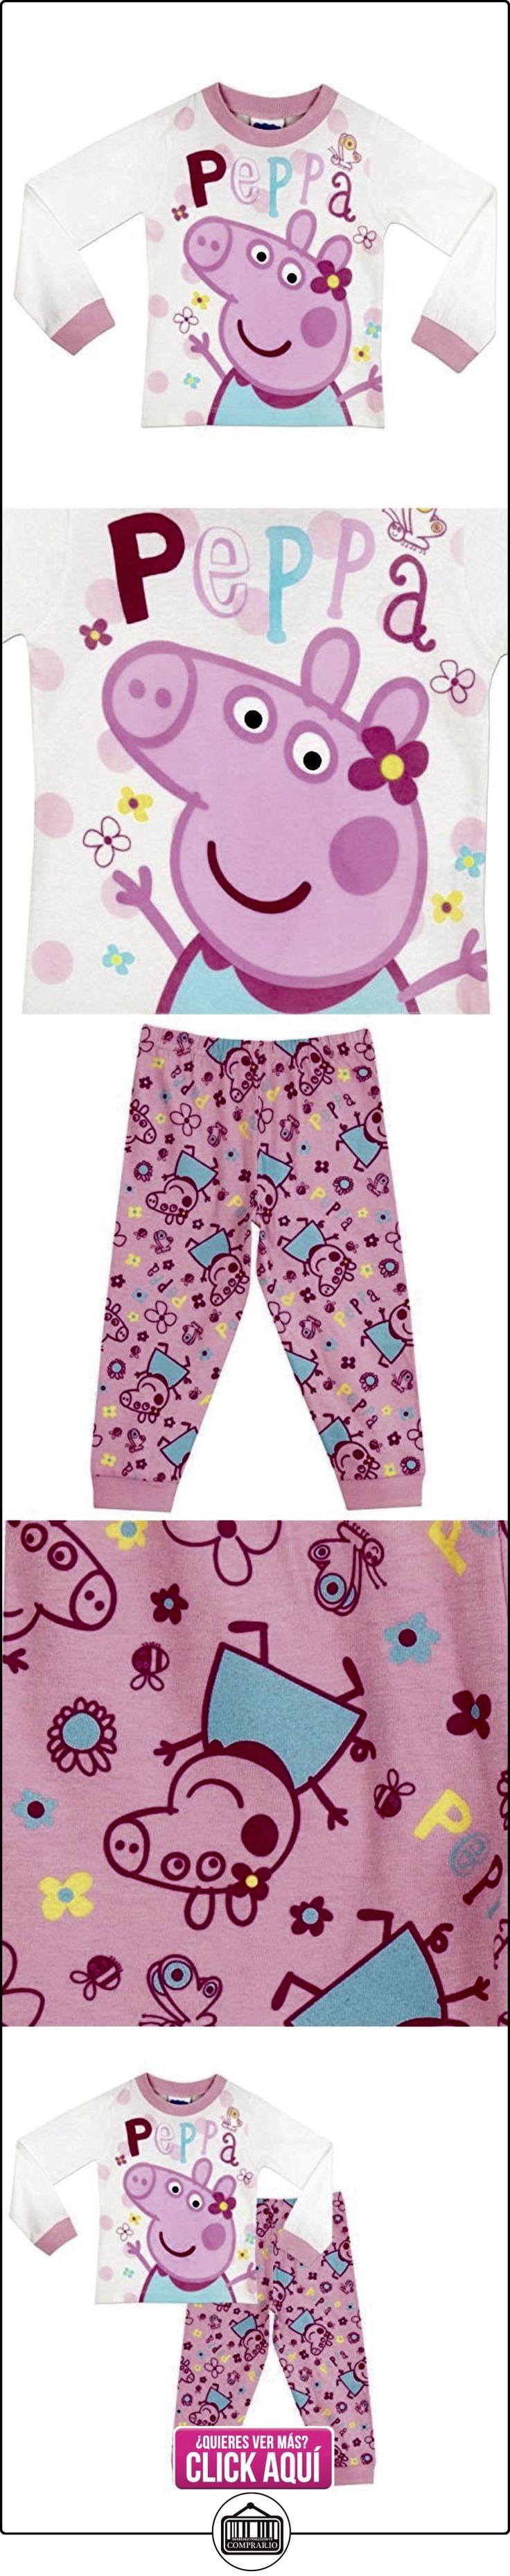 Peppa Pig - Pijama para niñas - Peppa Pig - 6 - 7 Años  ✿ Peppa Pig - Peppa La Cerdita ✿ ▬► Ver oferta: https://comprar.io/goto/B01M1BN7SB